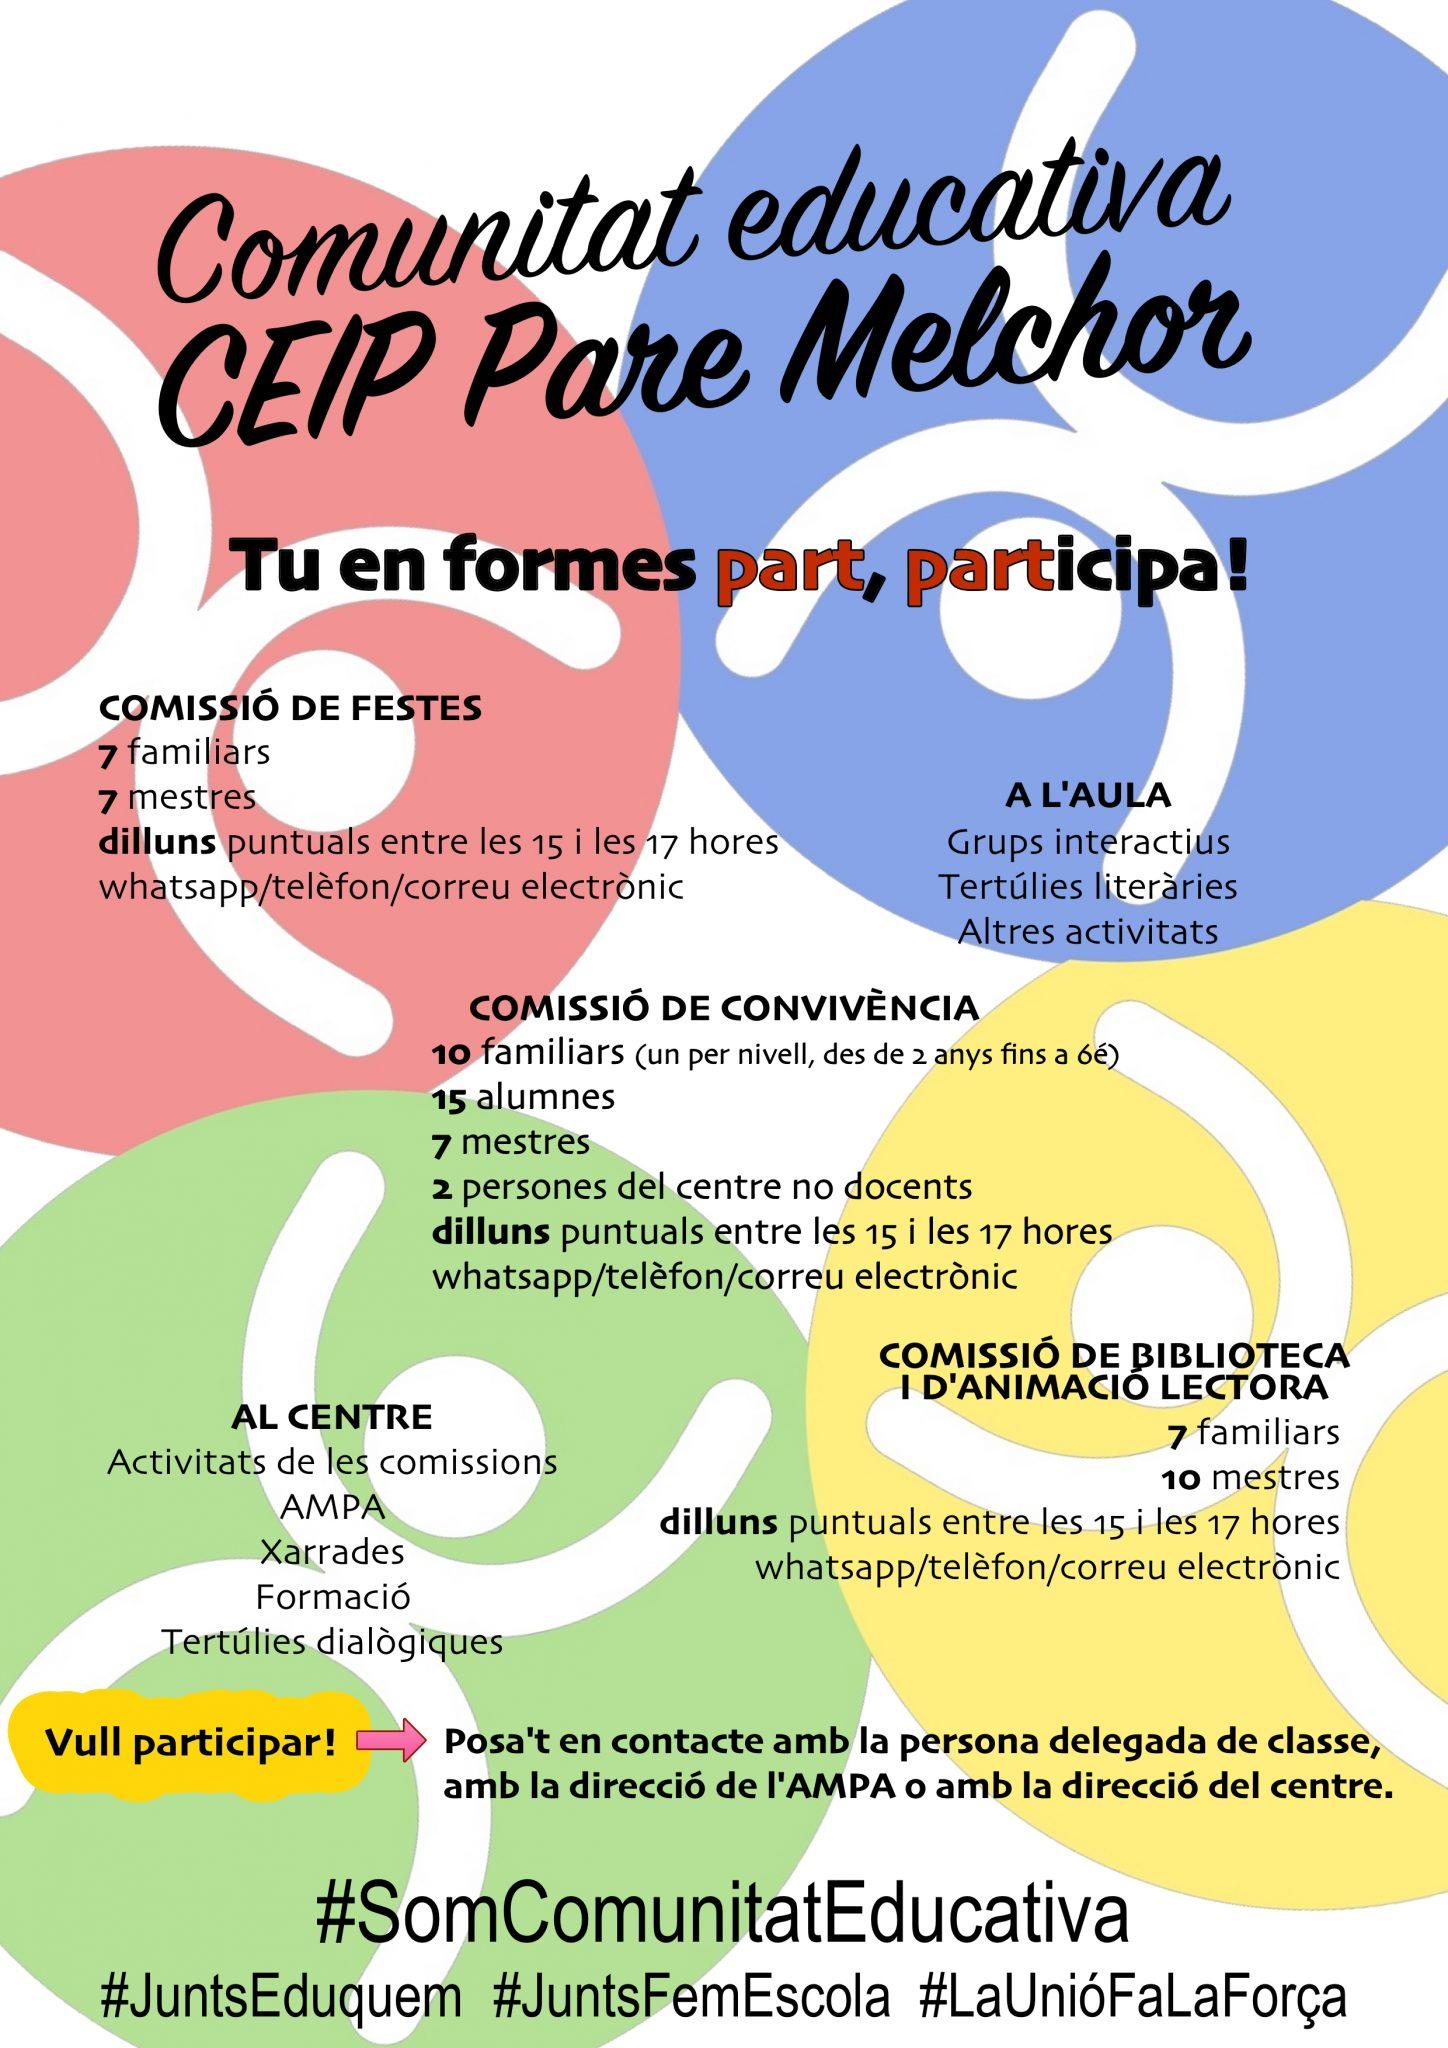 201910_comunitateducativa_ceipparemelchor